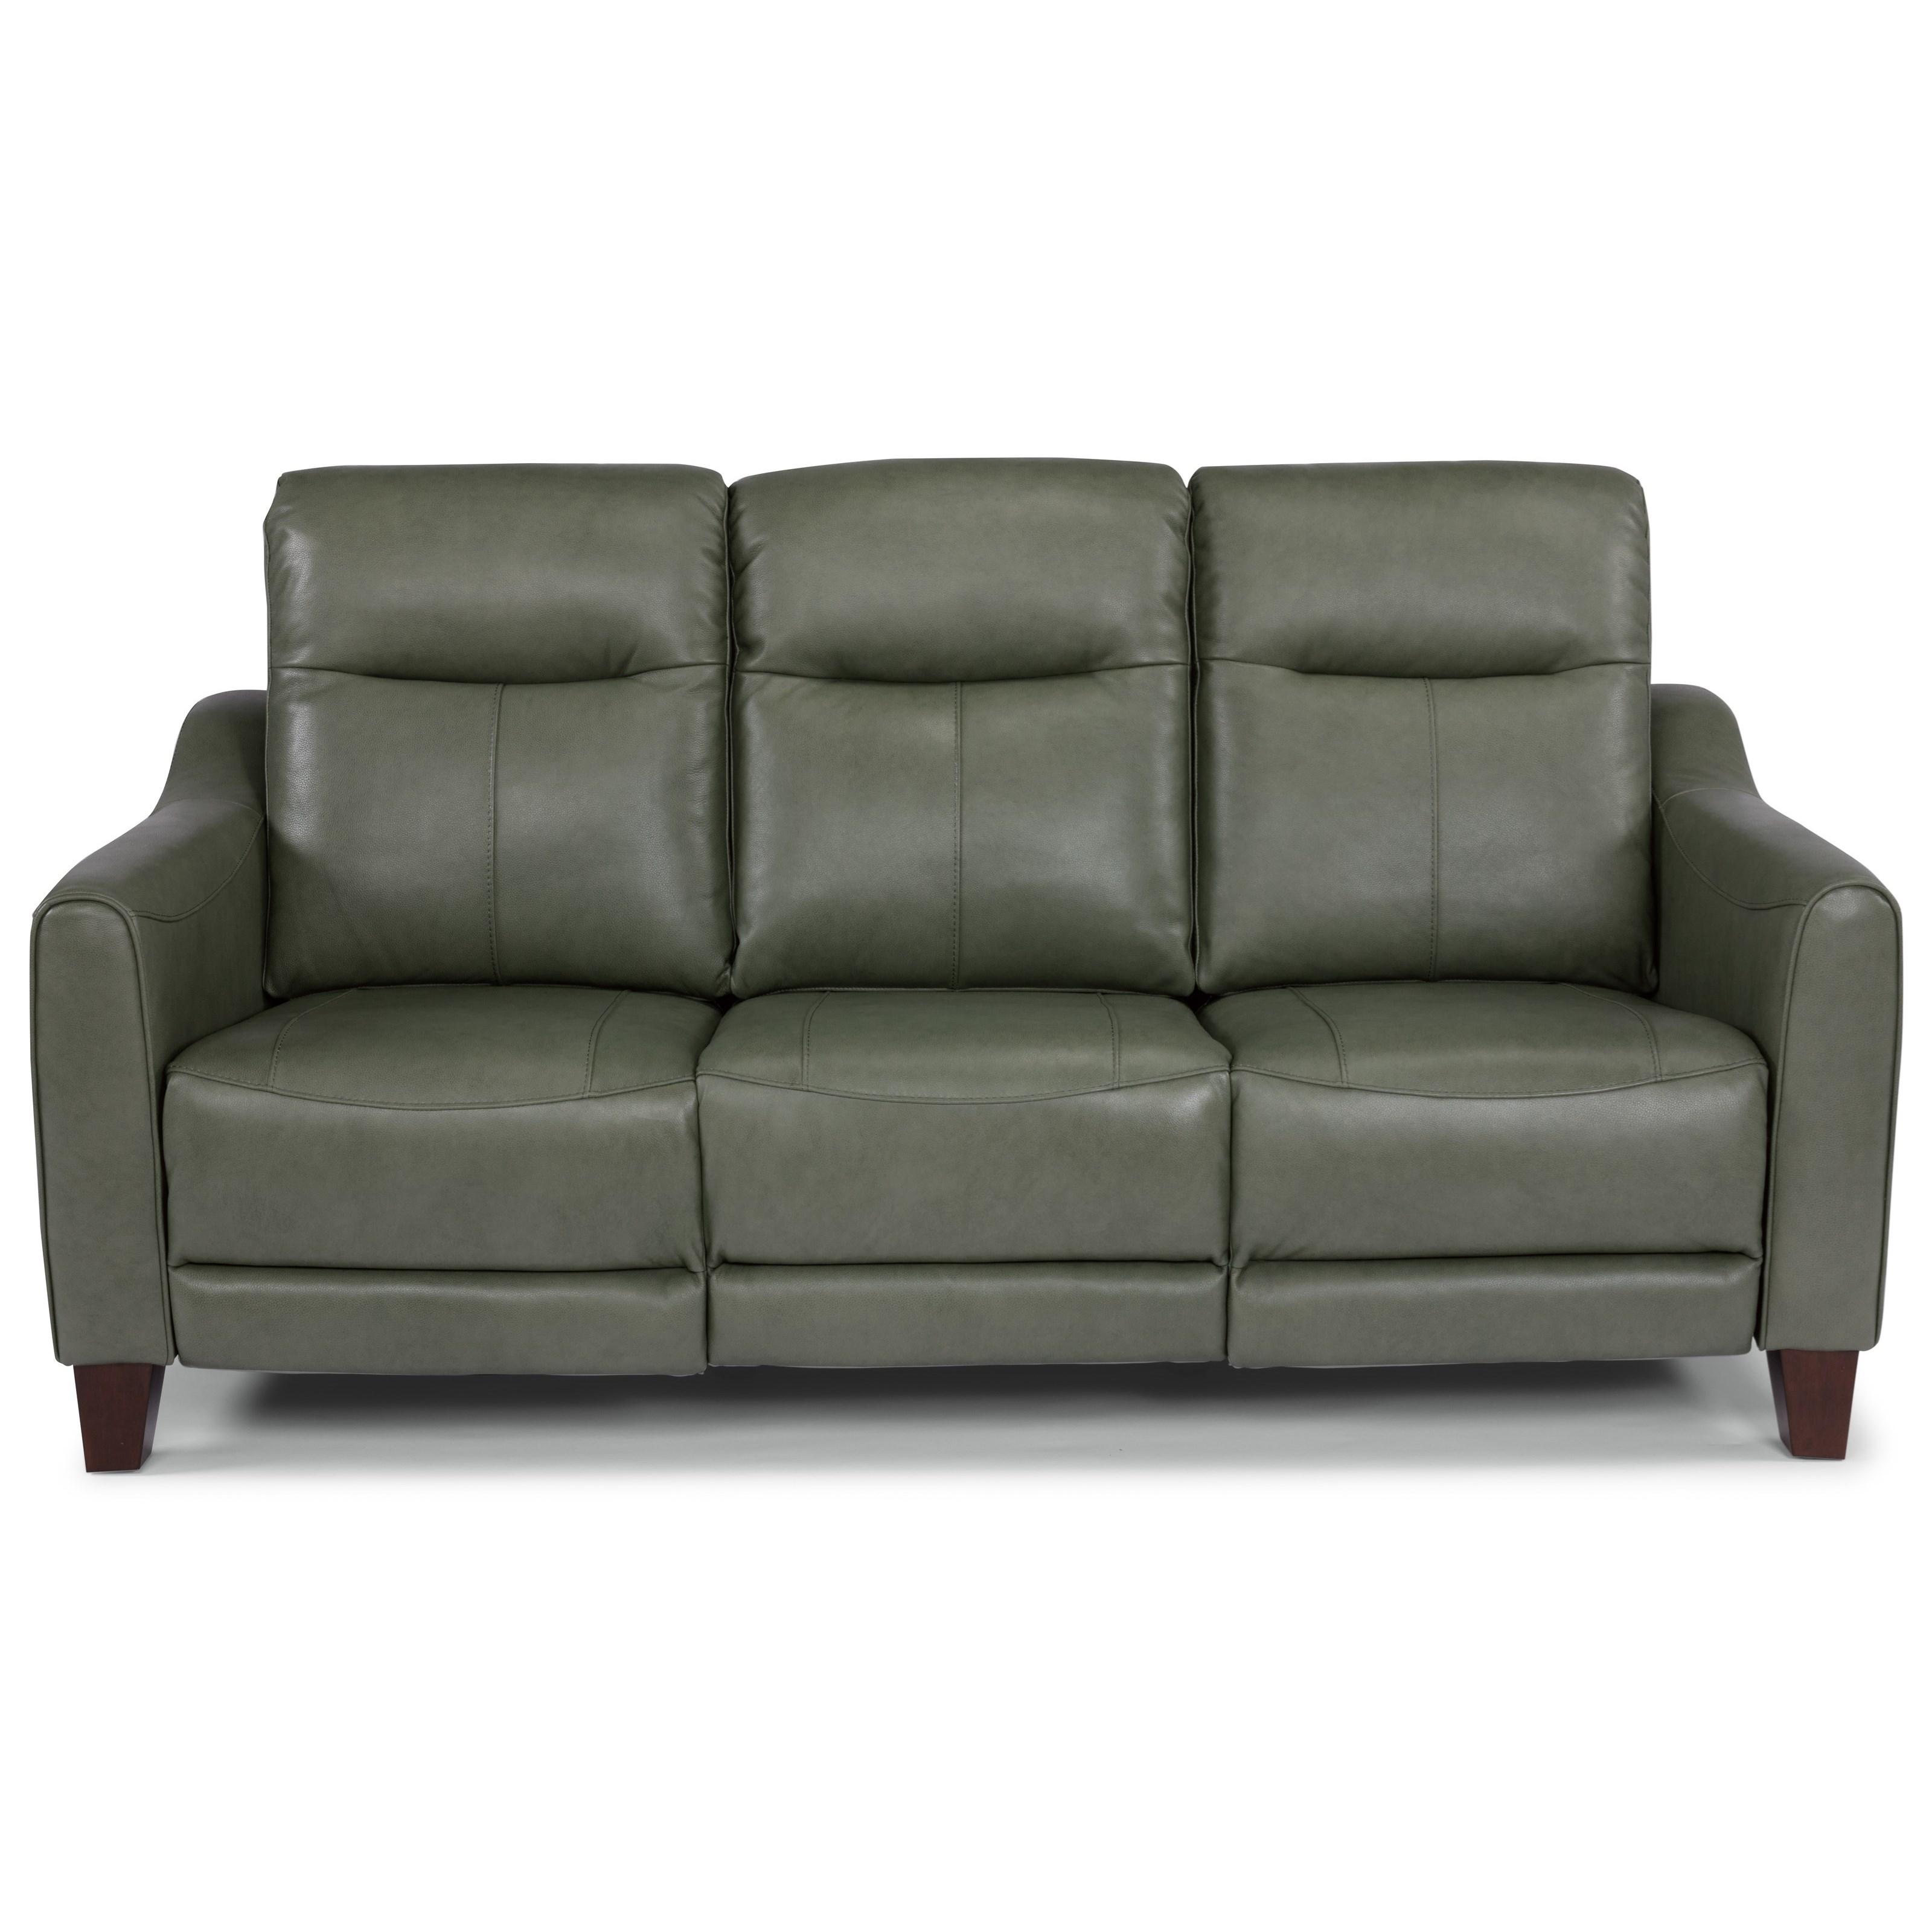 Latitudes - Forte Power Reclining Sofa by Flexsteel at Walker's Furniture